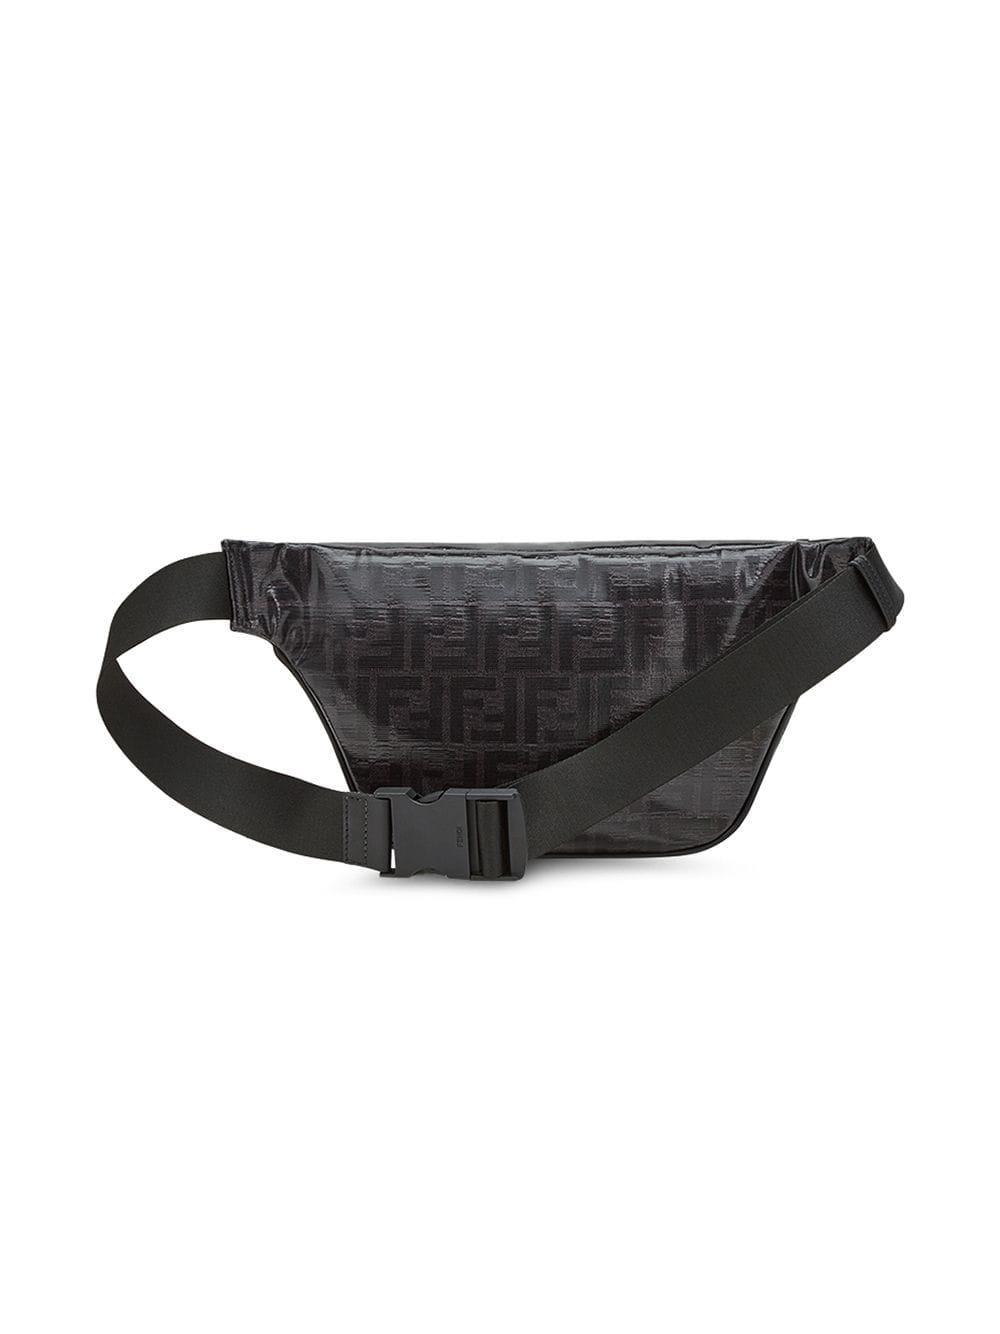 bb816e8602e Lyst - Fendi Black Mania Belt Bag in Black for Men - Save ...